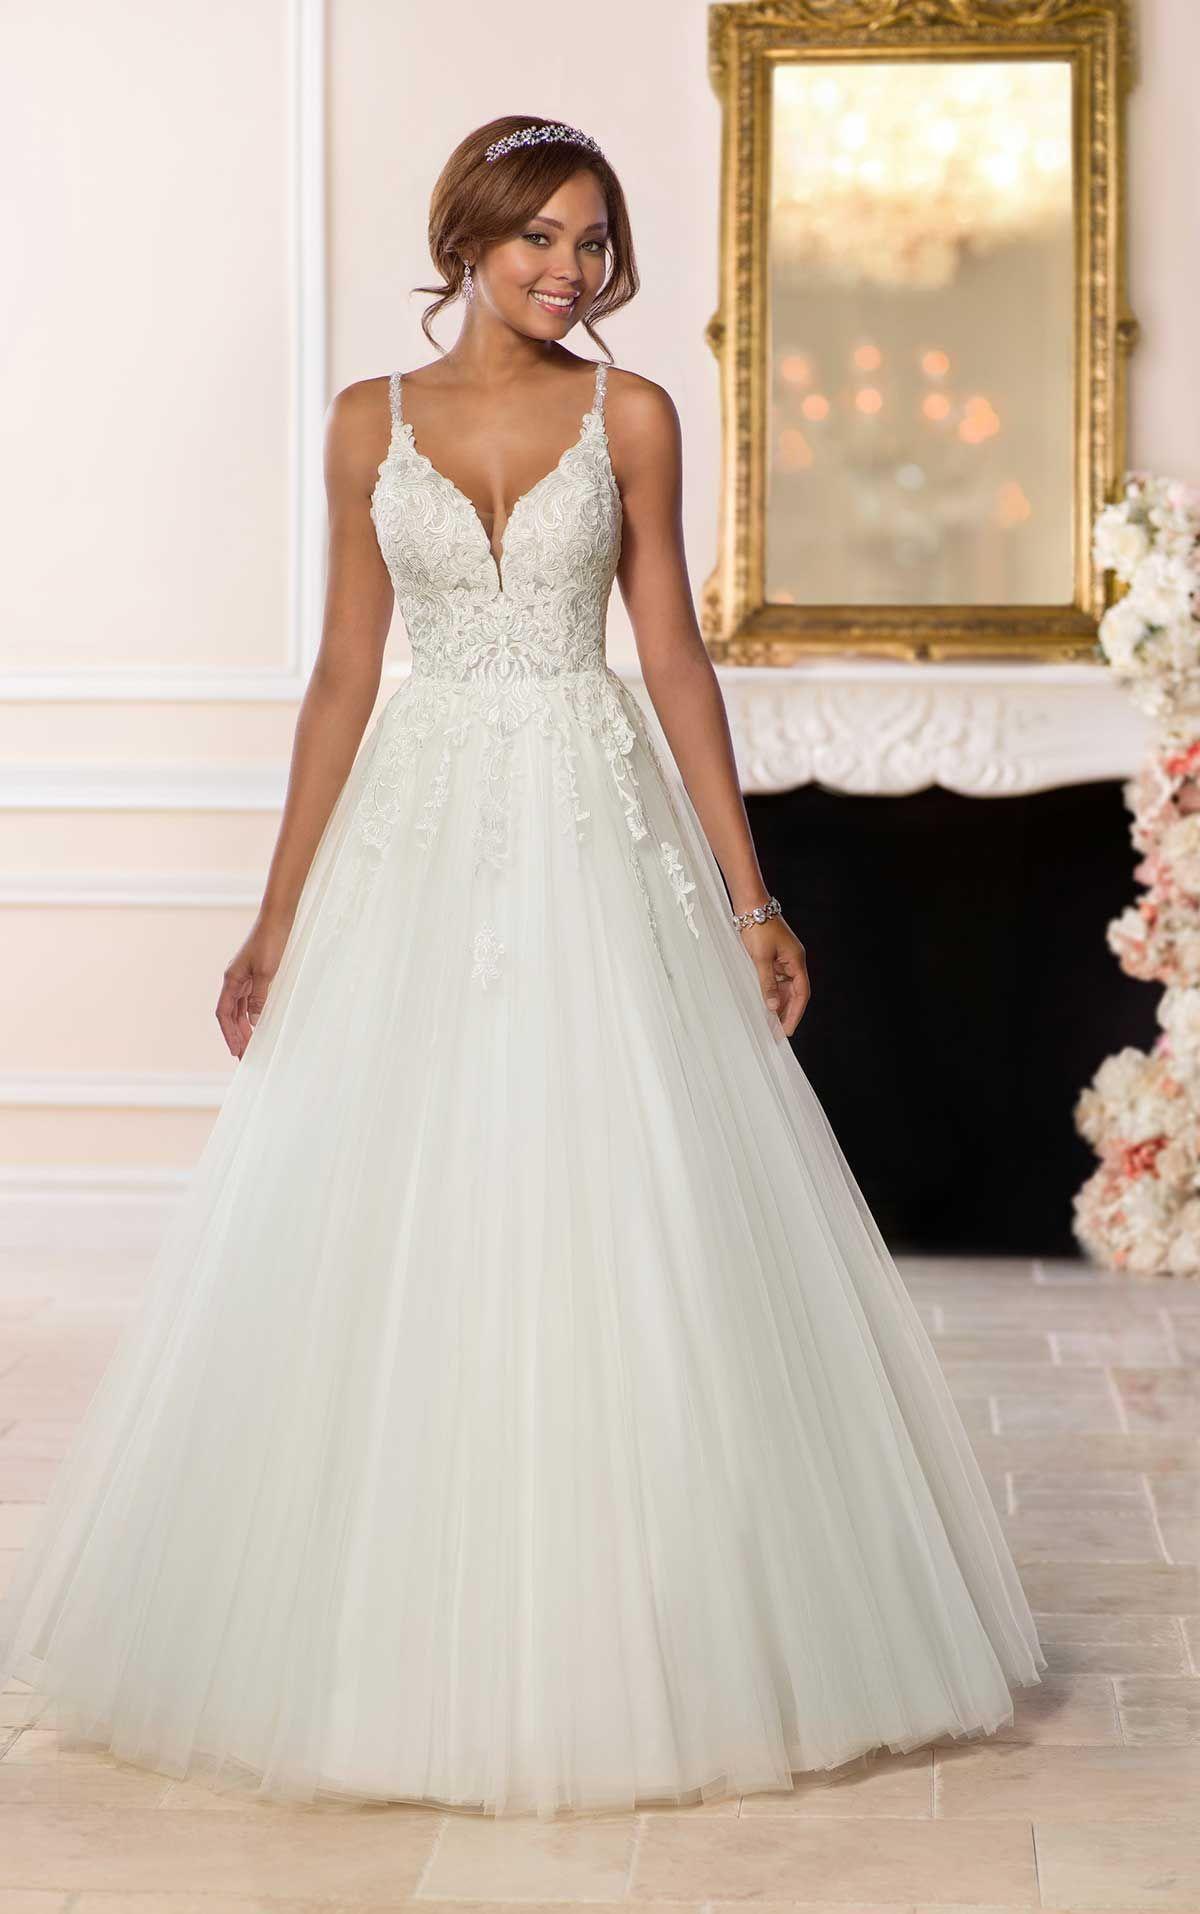 Stunning Boho Wedding Dress